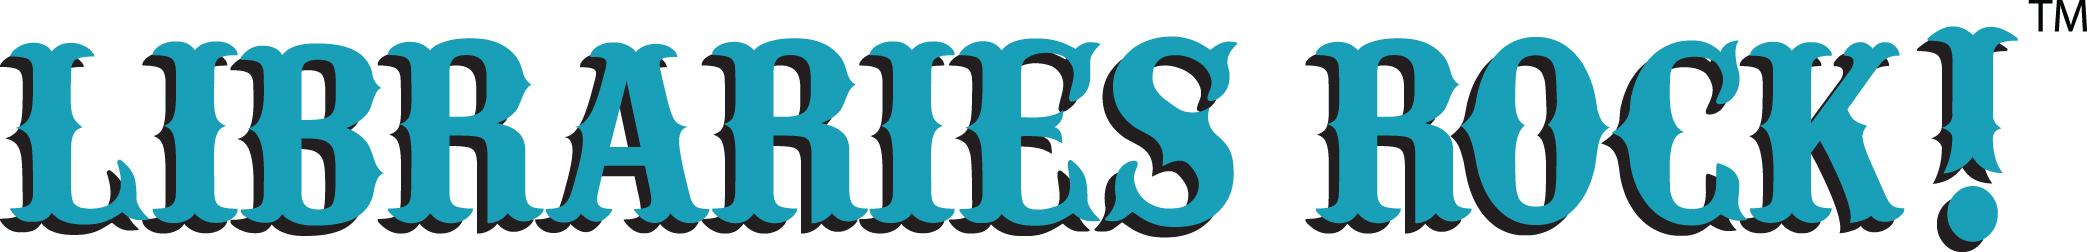 Slogan 11 cc2afee0